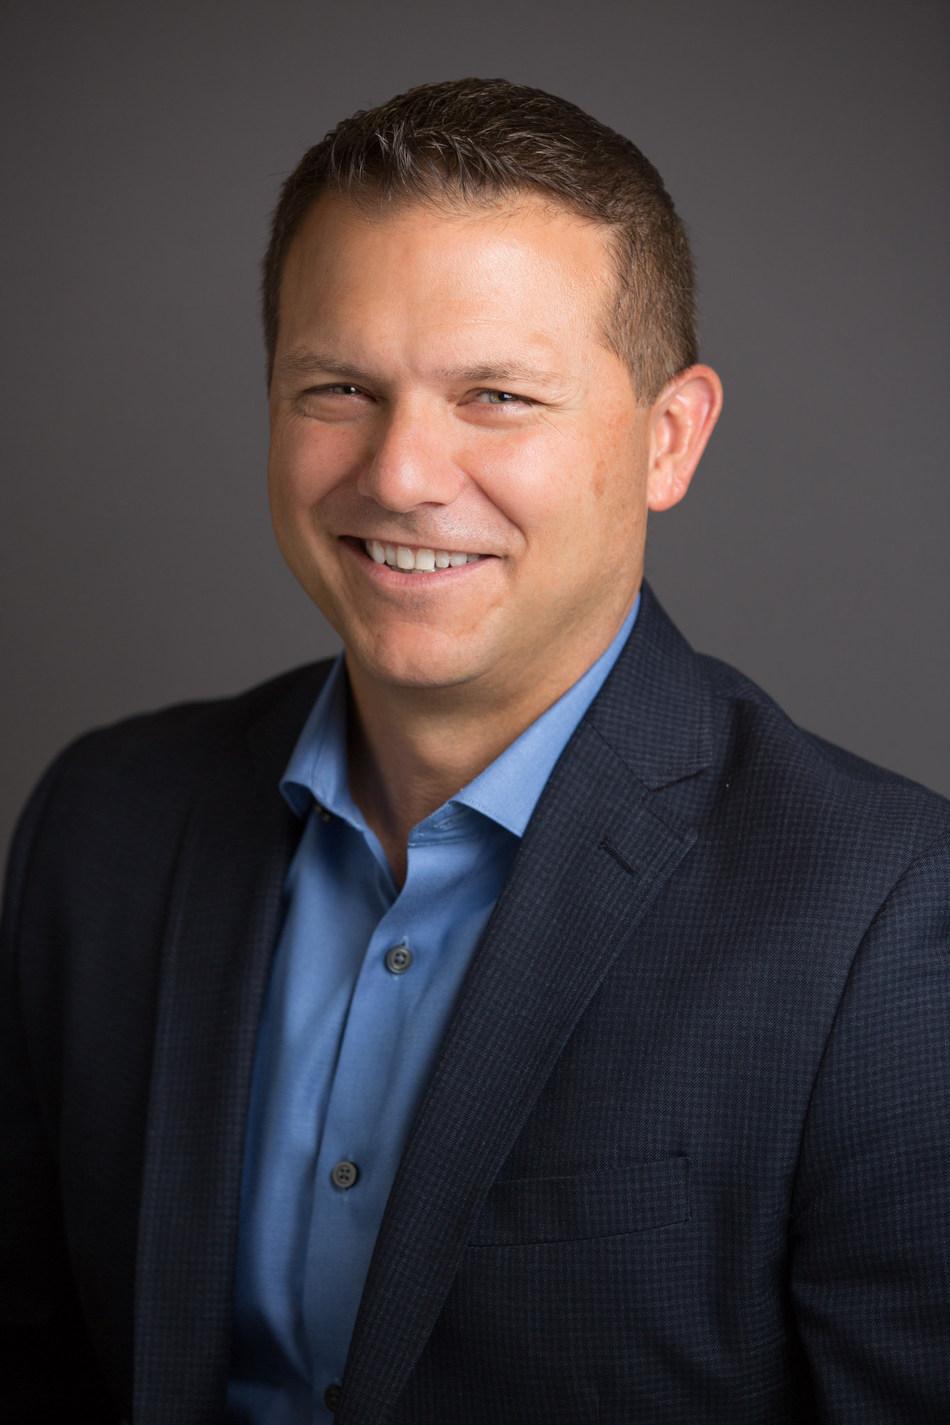 Patrick Rice, SVP of Sales, AbleTo